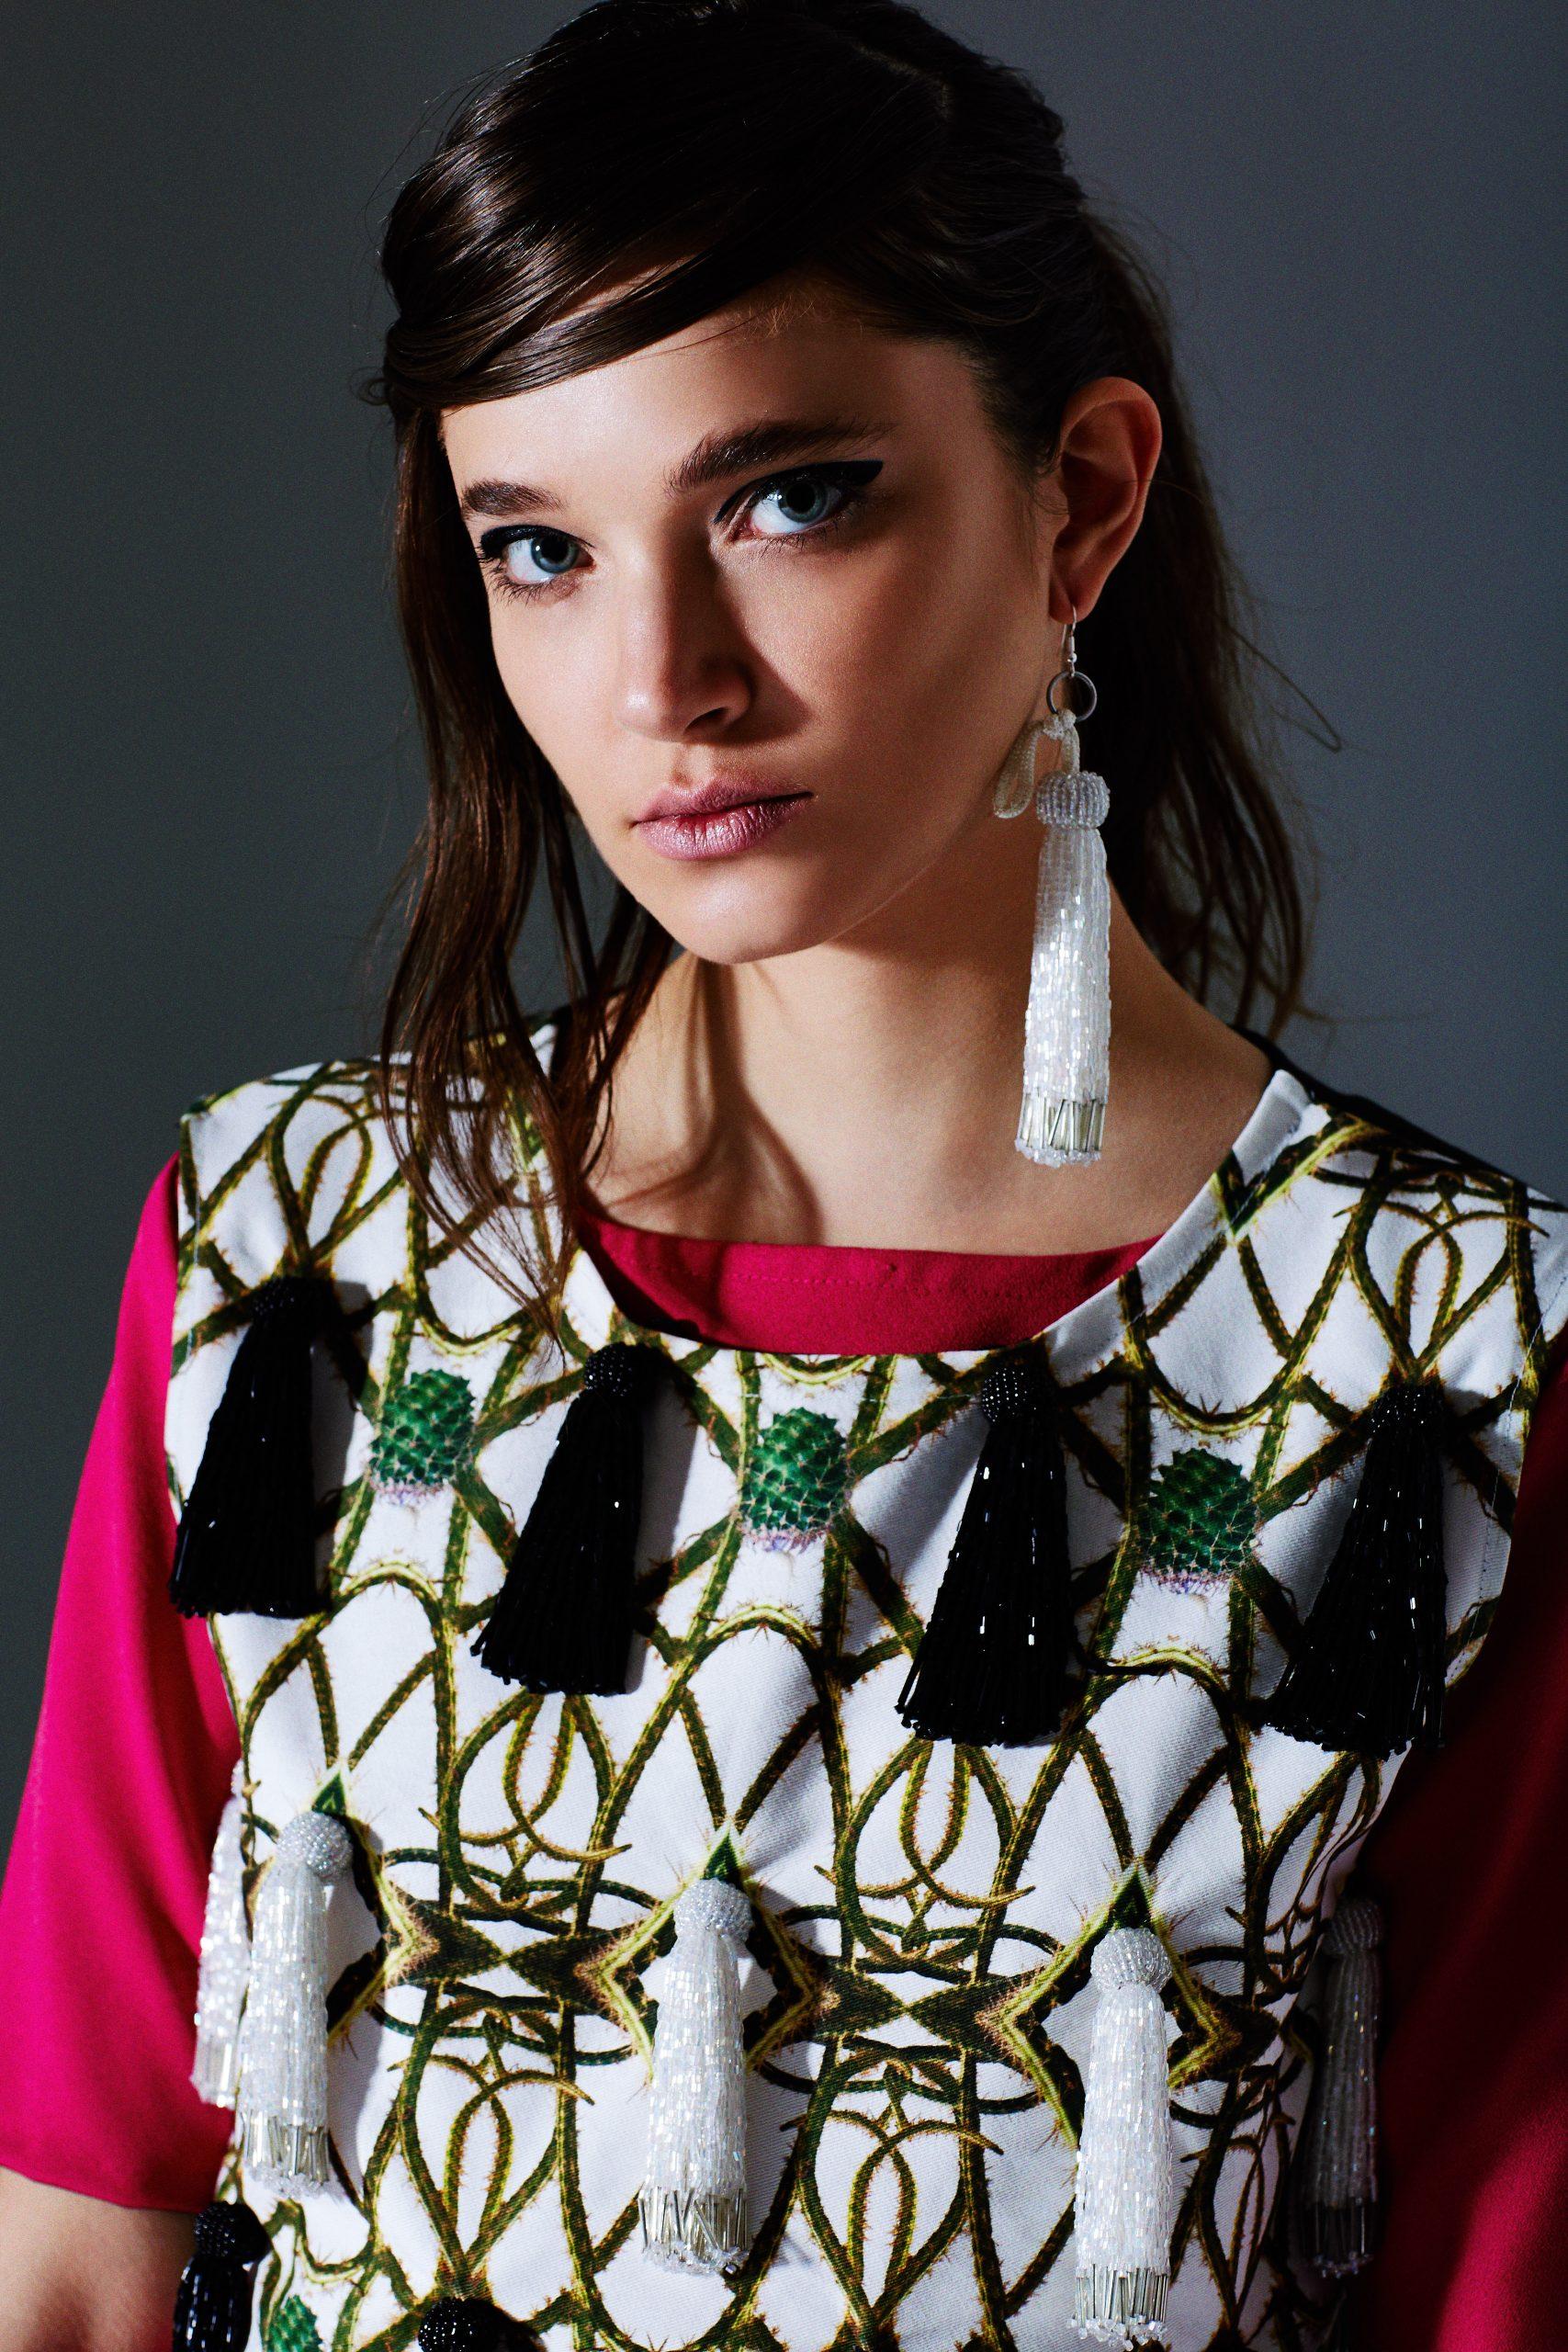 Makeup & Hair - Simone Graham Designer - David Longshaw AW16/17 Photographer - Alexander Jordan Model - Julia Gubert @ Next